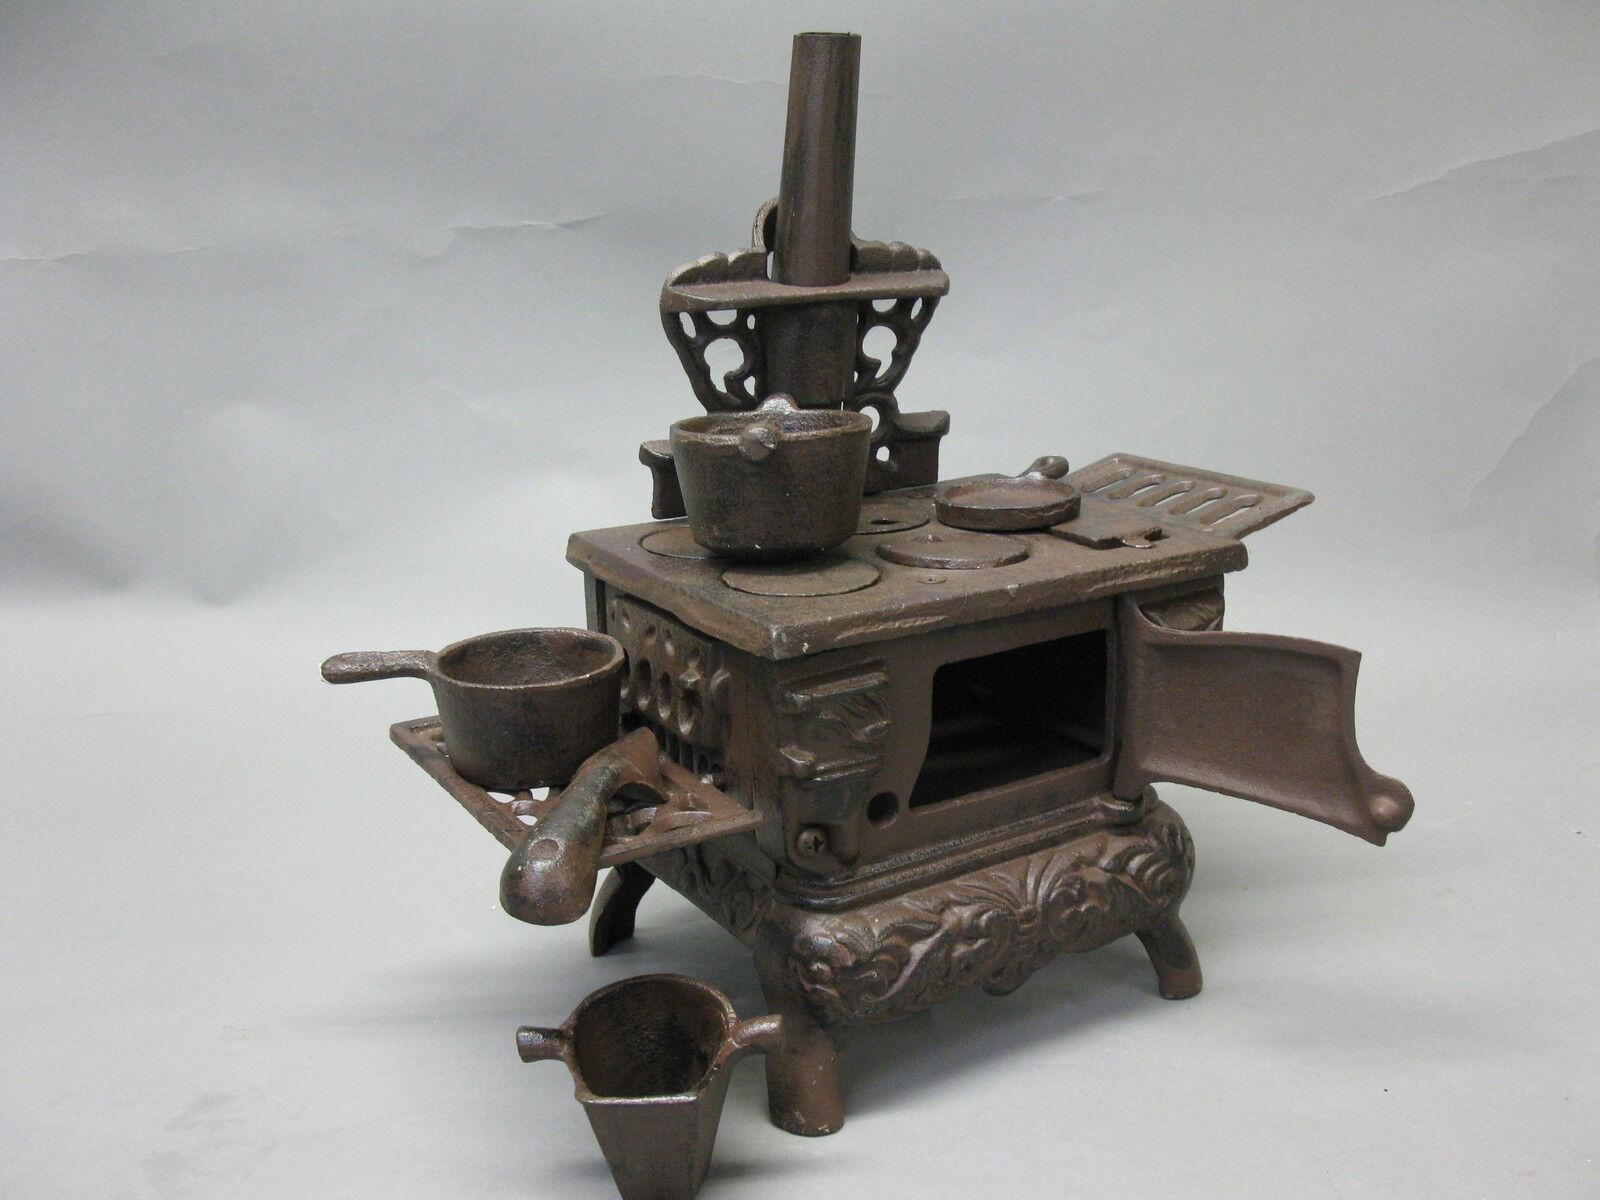 Vintage Doll Stove Dolls Decor Oven Kitchen Witch 25 cm Cast Iron 4,5 KG